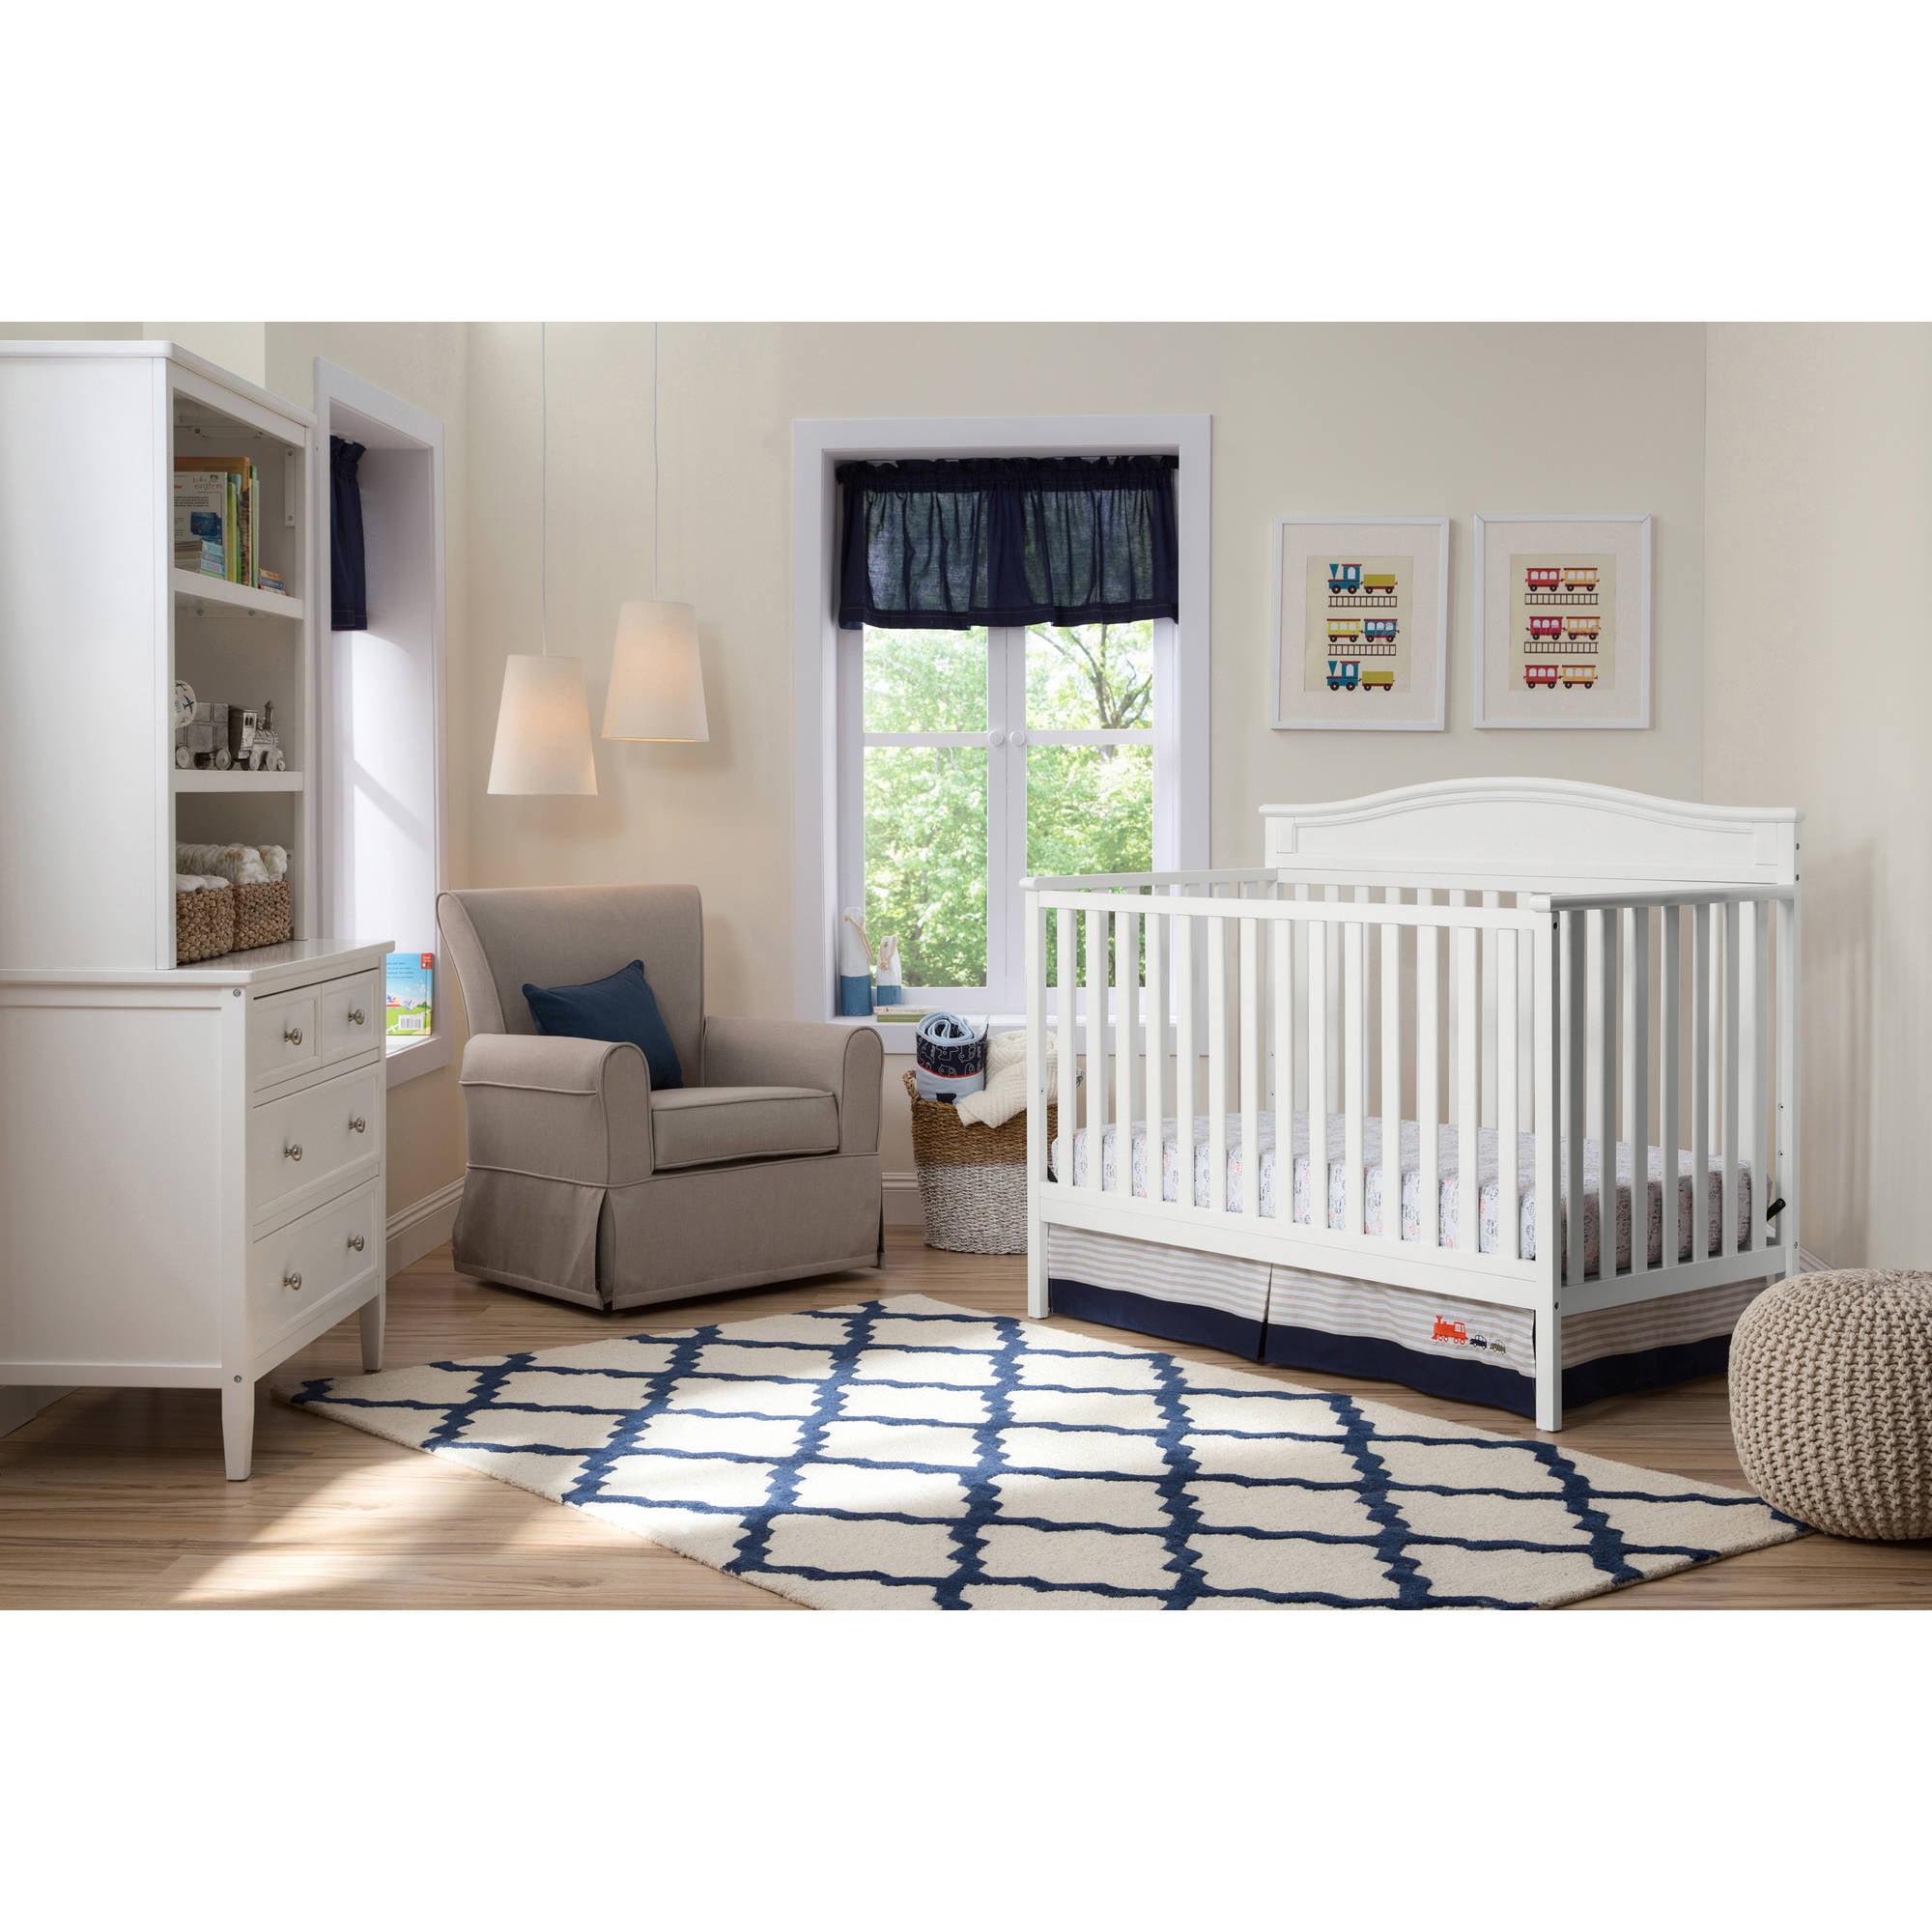 Delta Children Larkin 4-in-1 Crib, (Choose Your Finish)